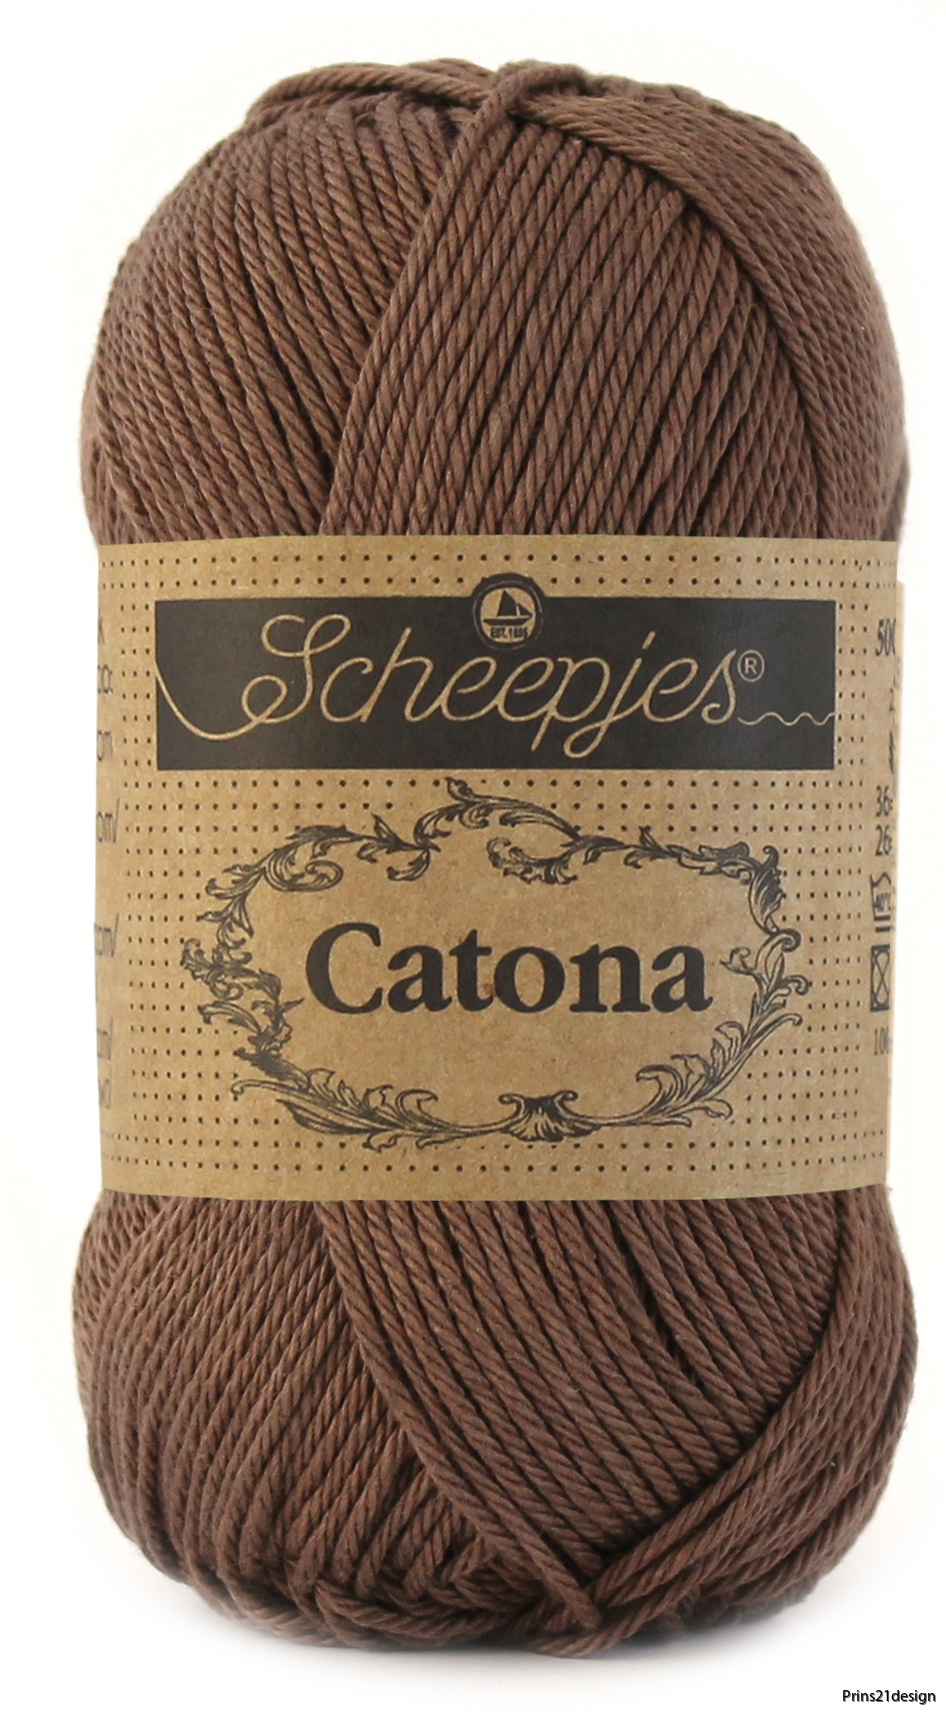 Scheepjes Catona 507 Chocolate